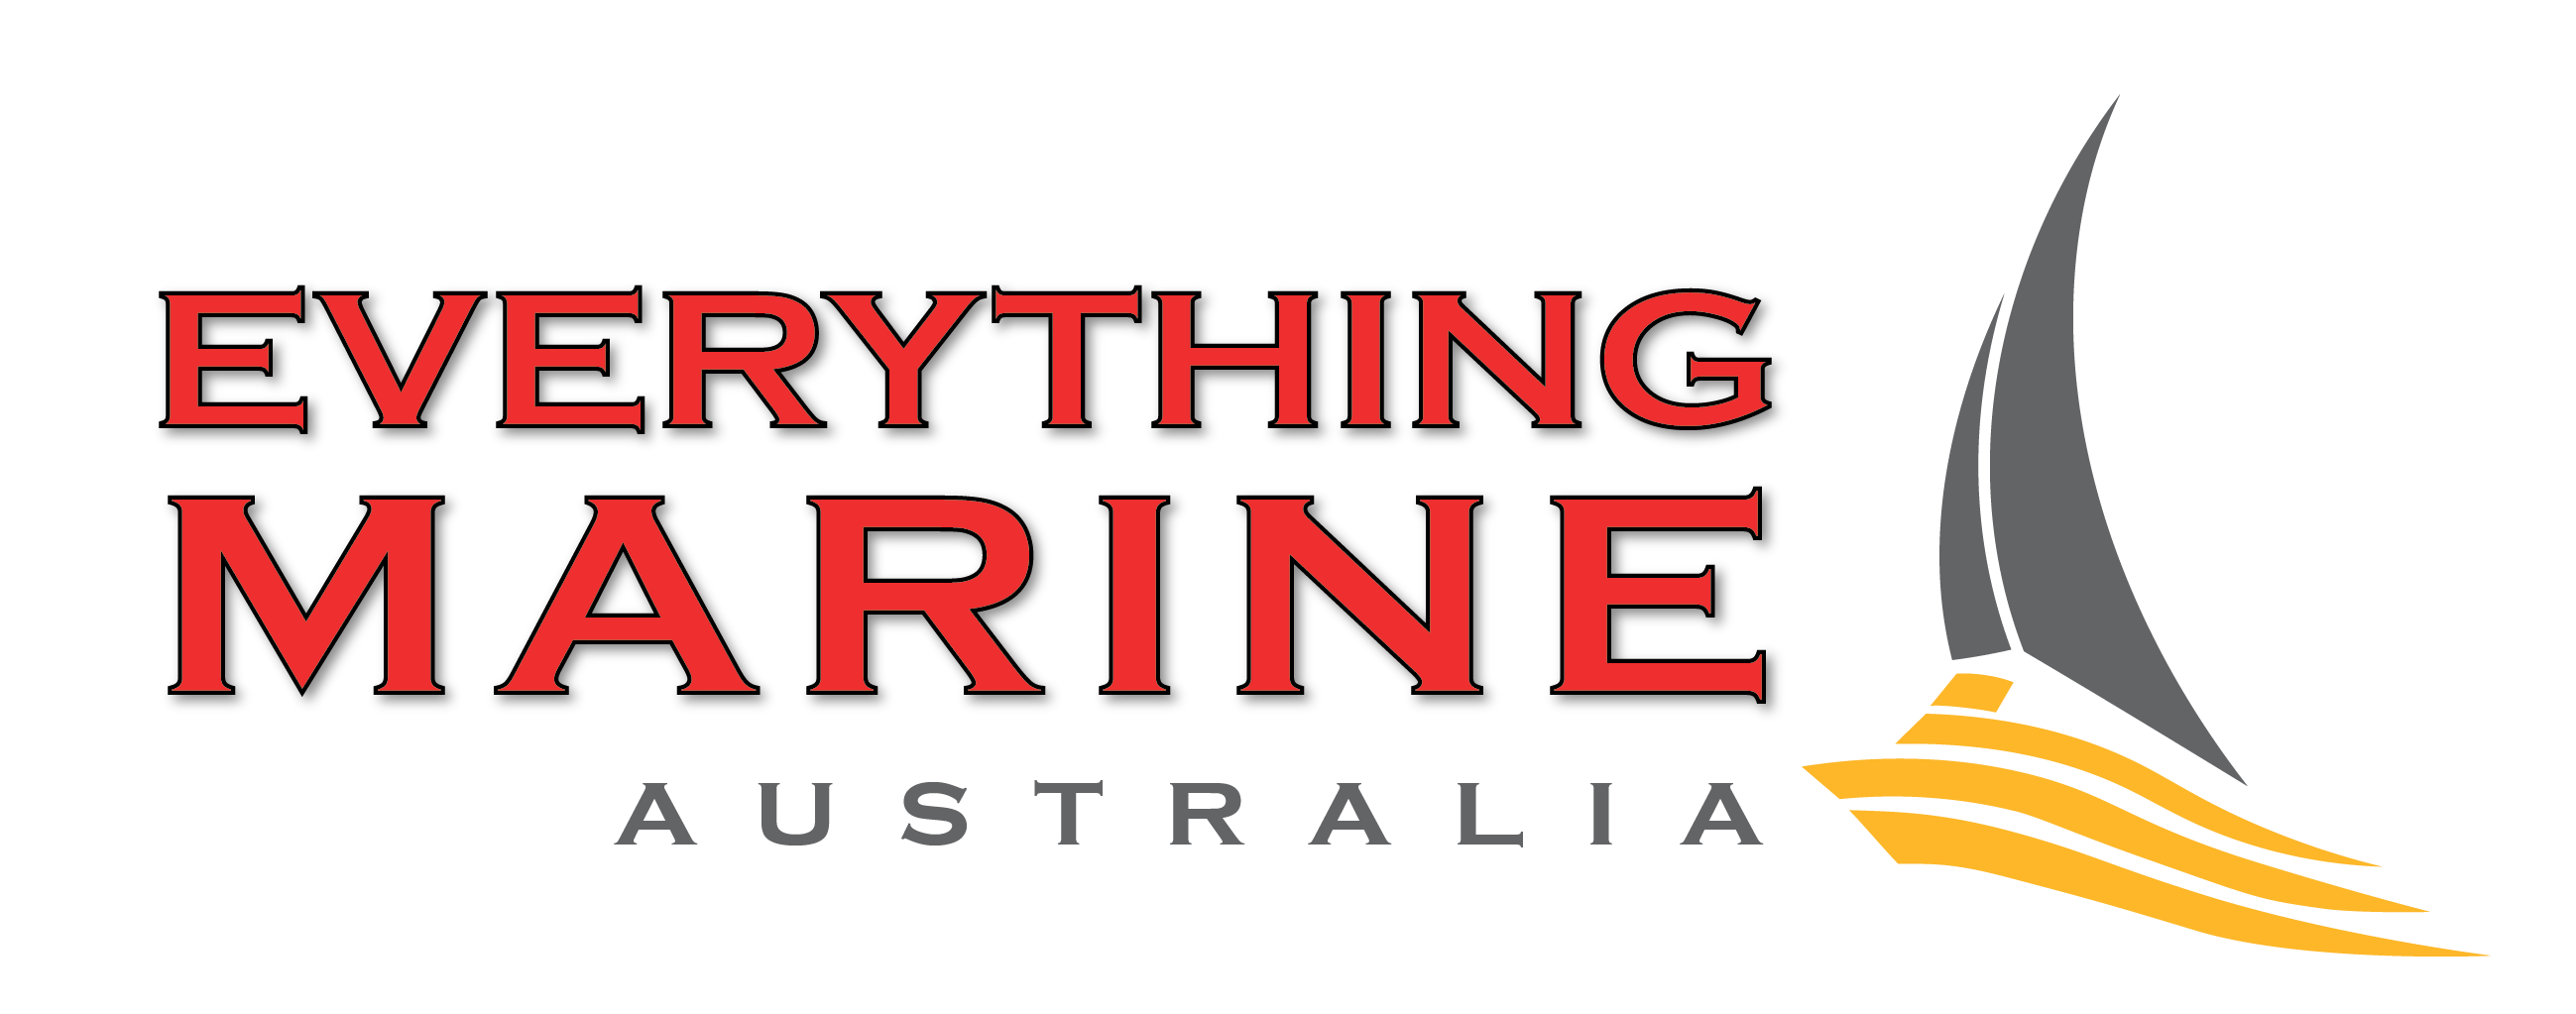 Everything Marine Australia